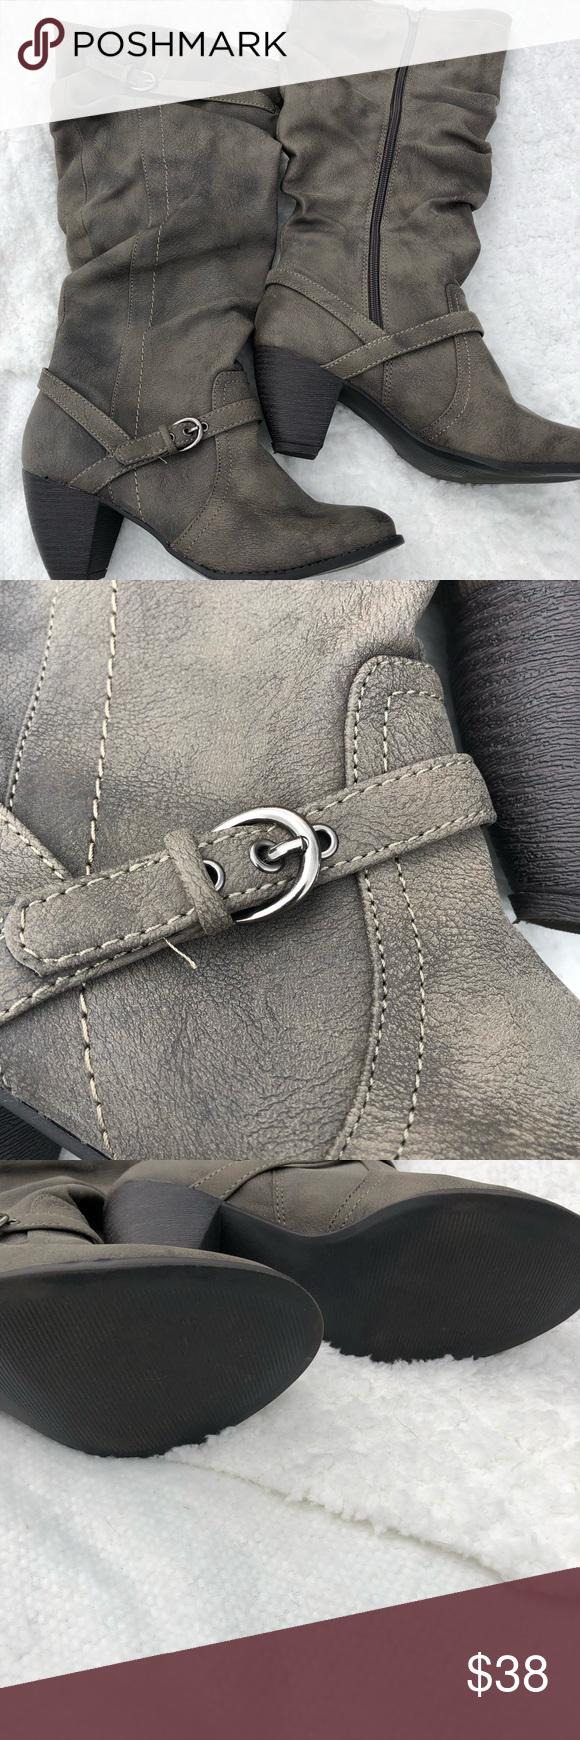 Dark gray jelly pop Nielsen tall boots